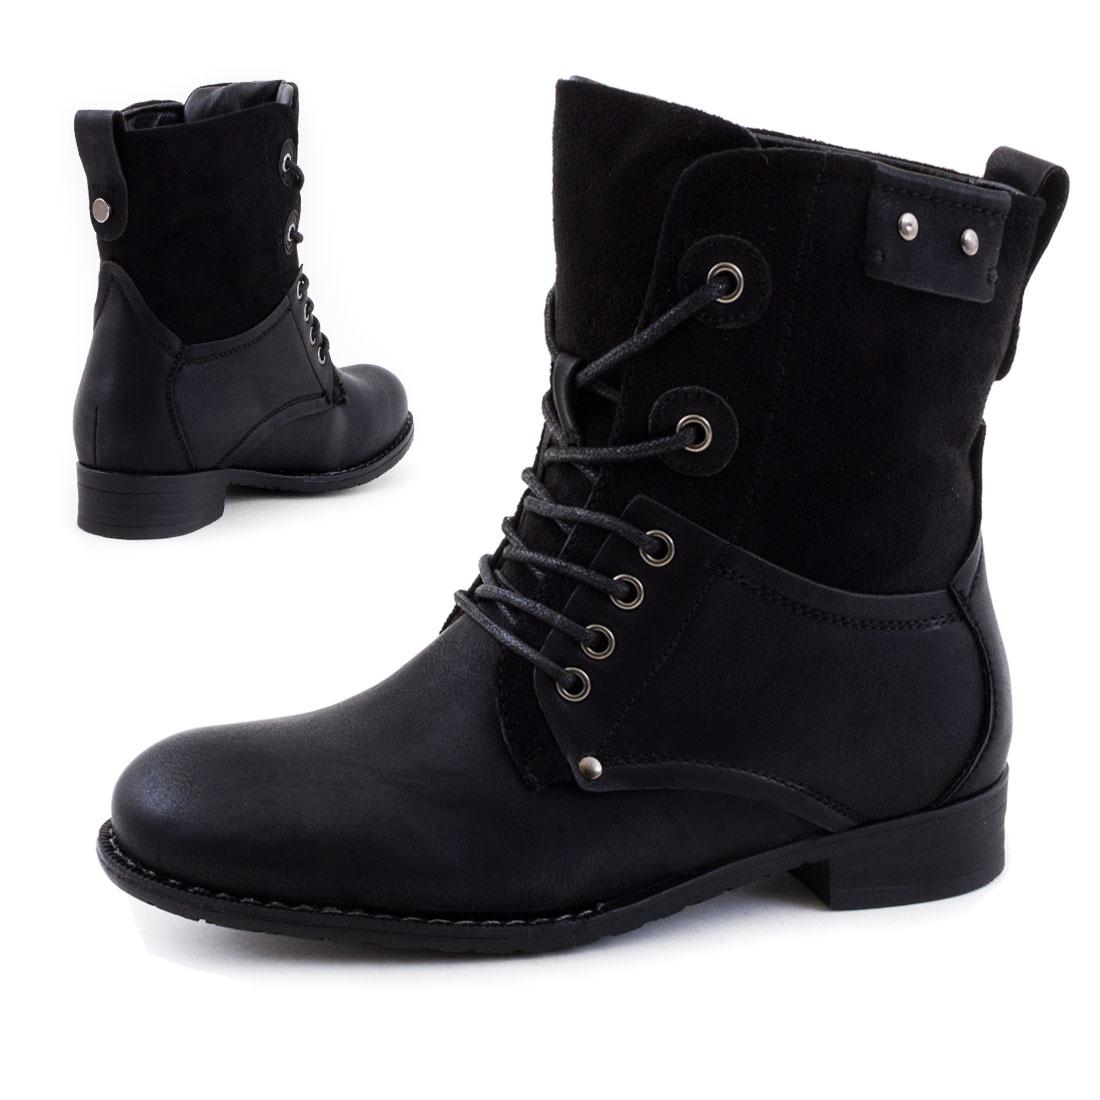 neu damen biker stiefeletten stiefel worker boots schuhe gr 36 37 38 39 40 41 ebay. Black Bedroom Furniture Sets. Home Design Ideas